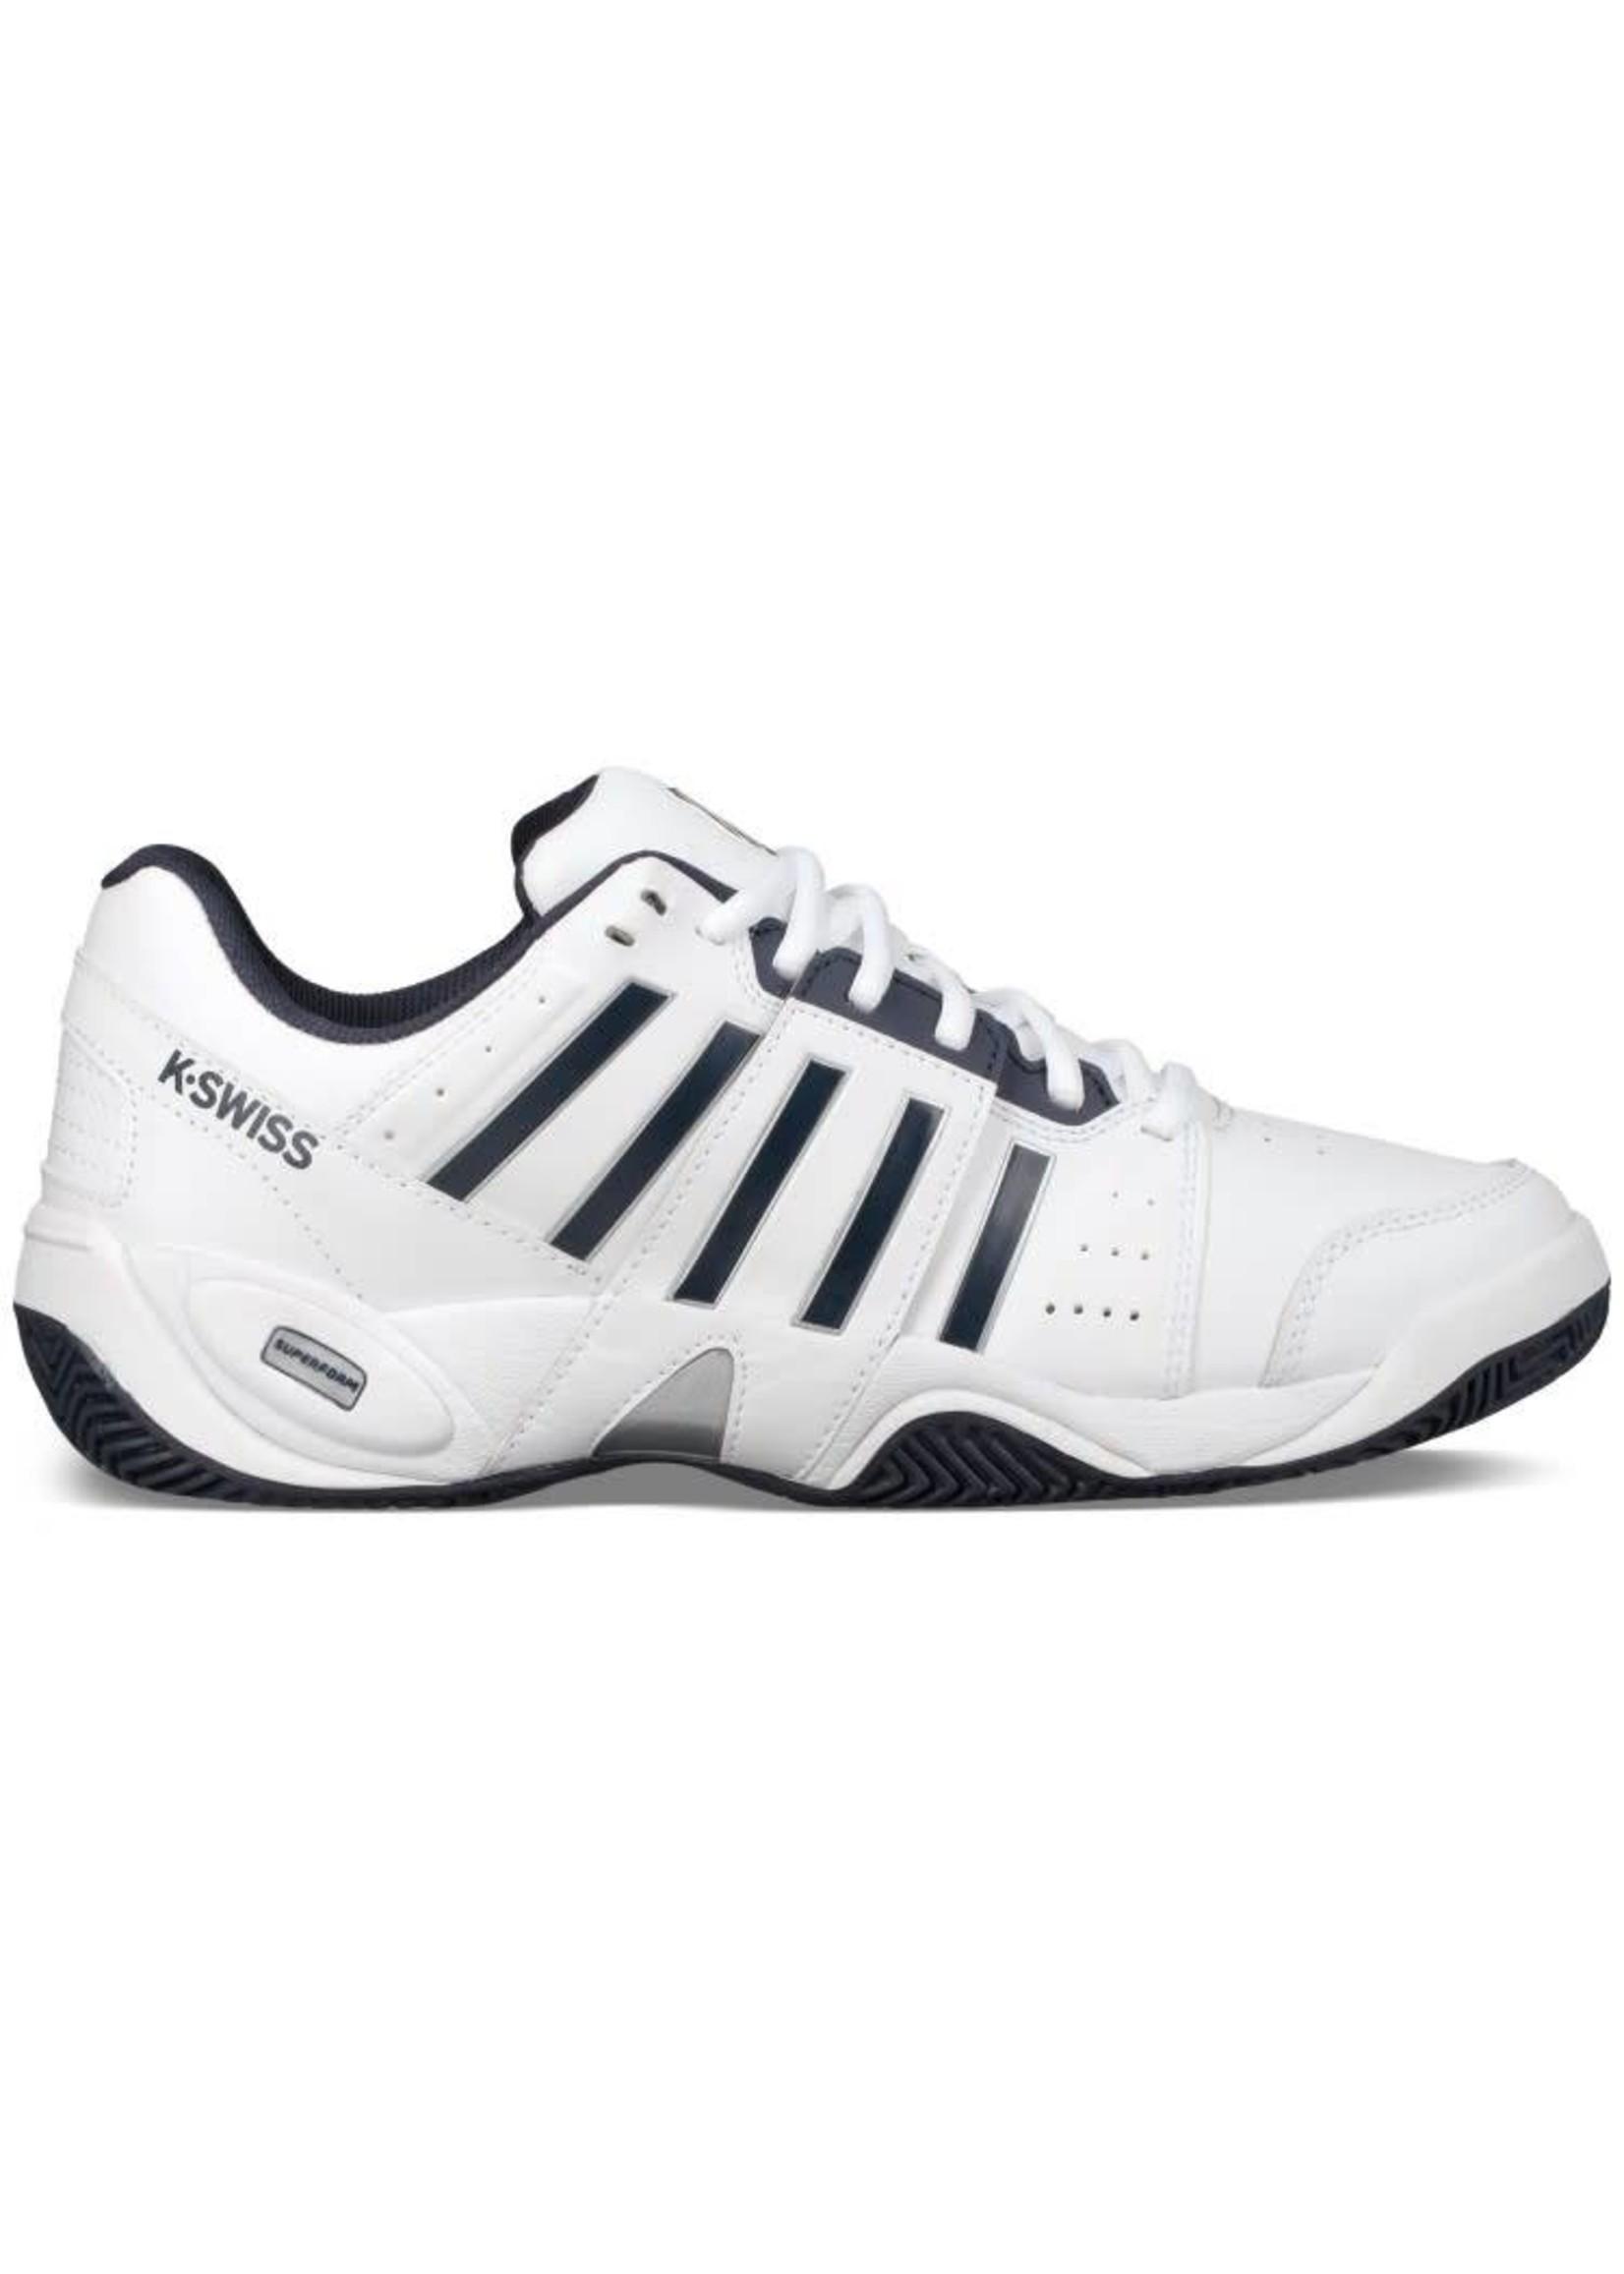 K Swiss K Swiss Accomplish 3 Omni Mens Tennis Shoe - White (2018)